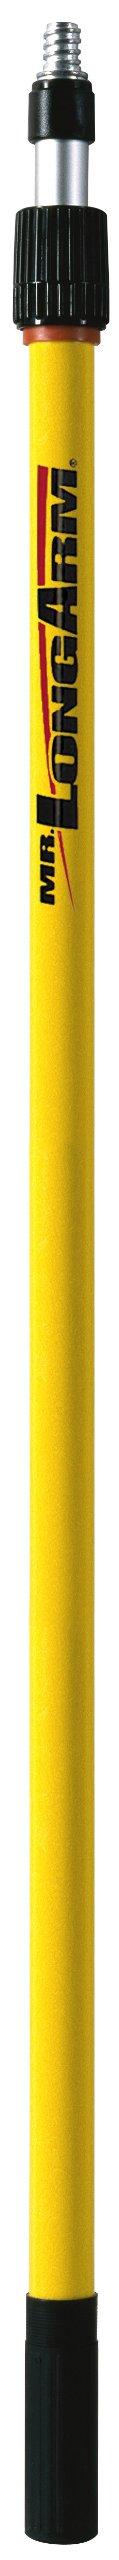 Mr. LongArm 6508 Heavy Duty Alumiglass Extension Pole 4-to-8 Foot